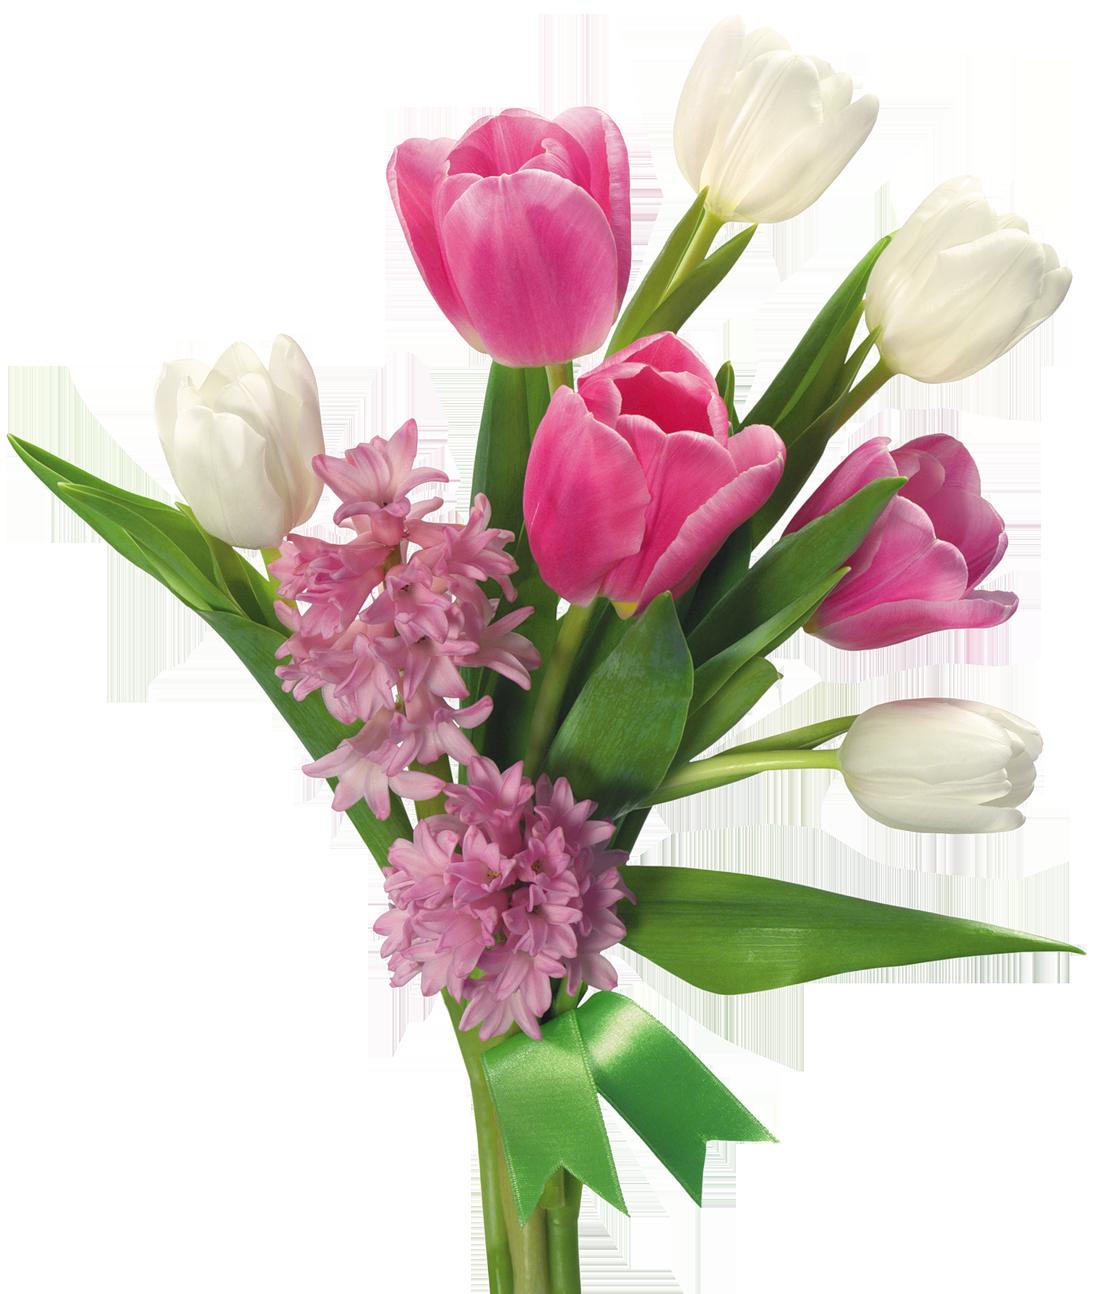 Flower bunch png. Bouquet images transparent free